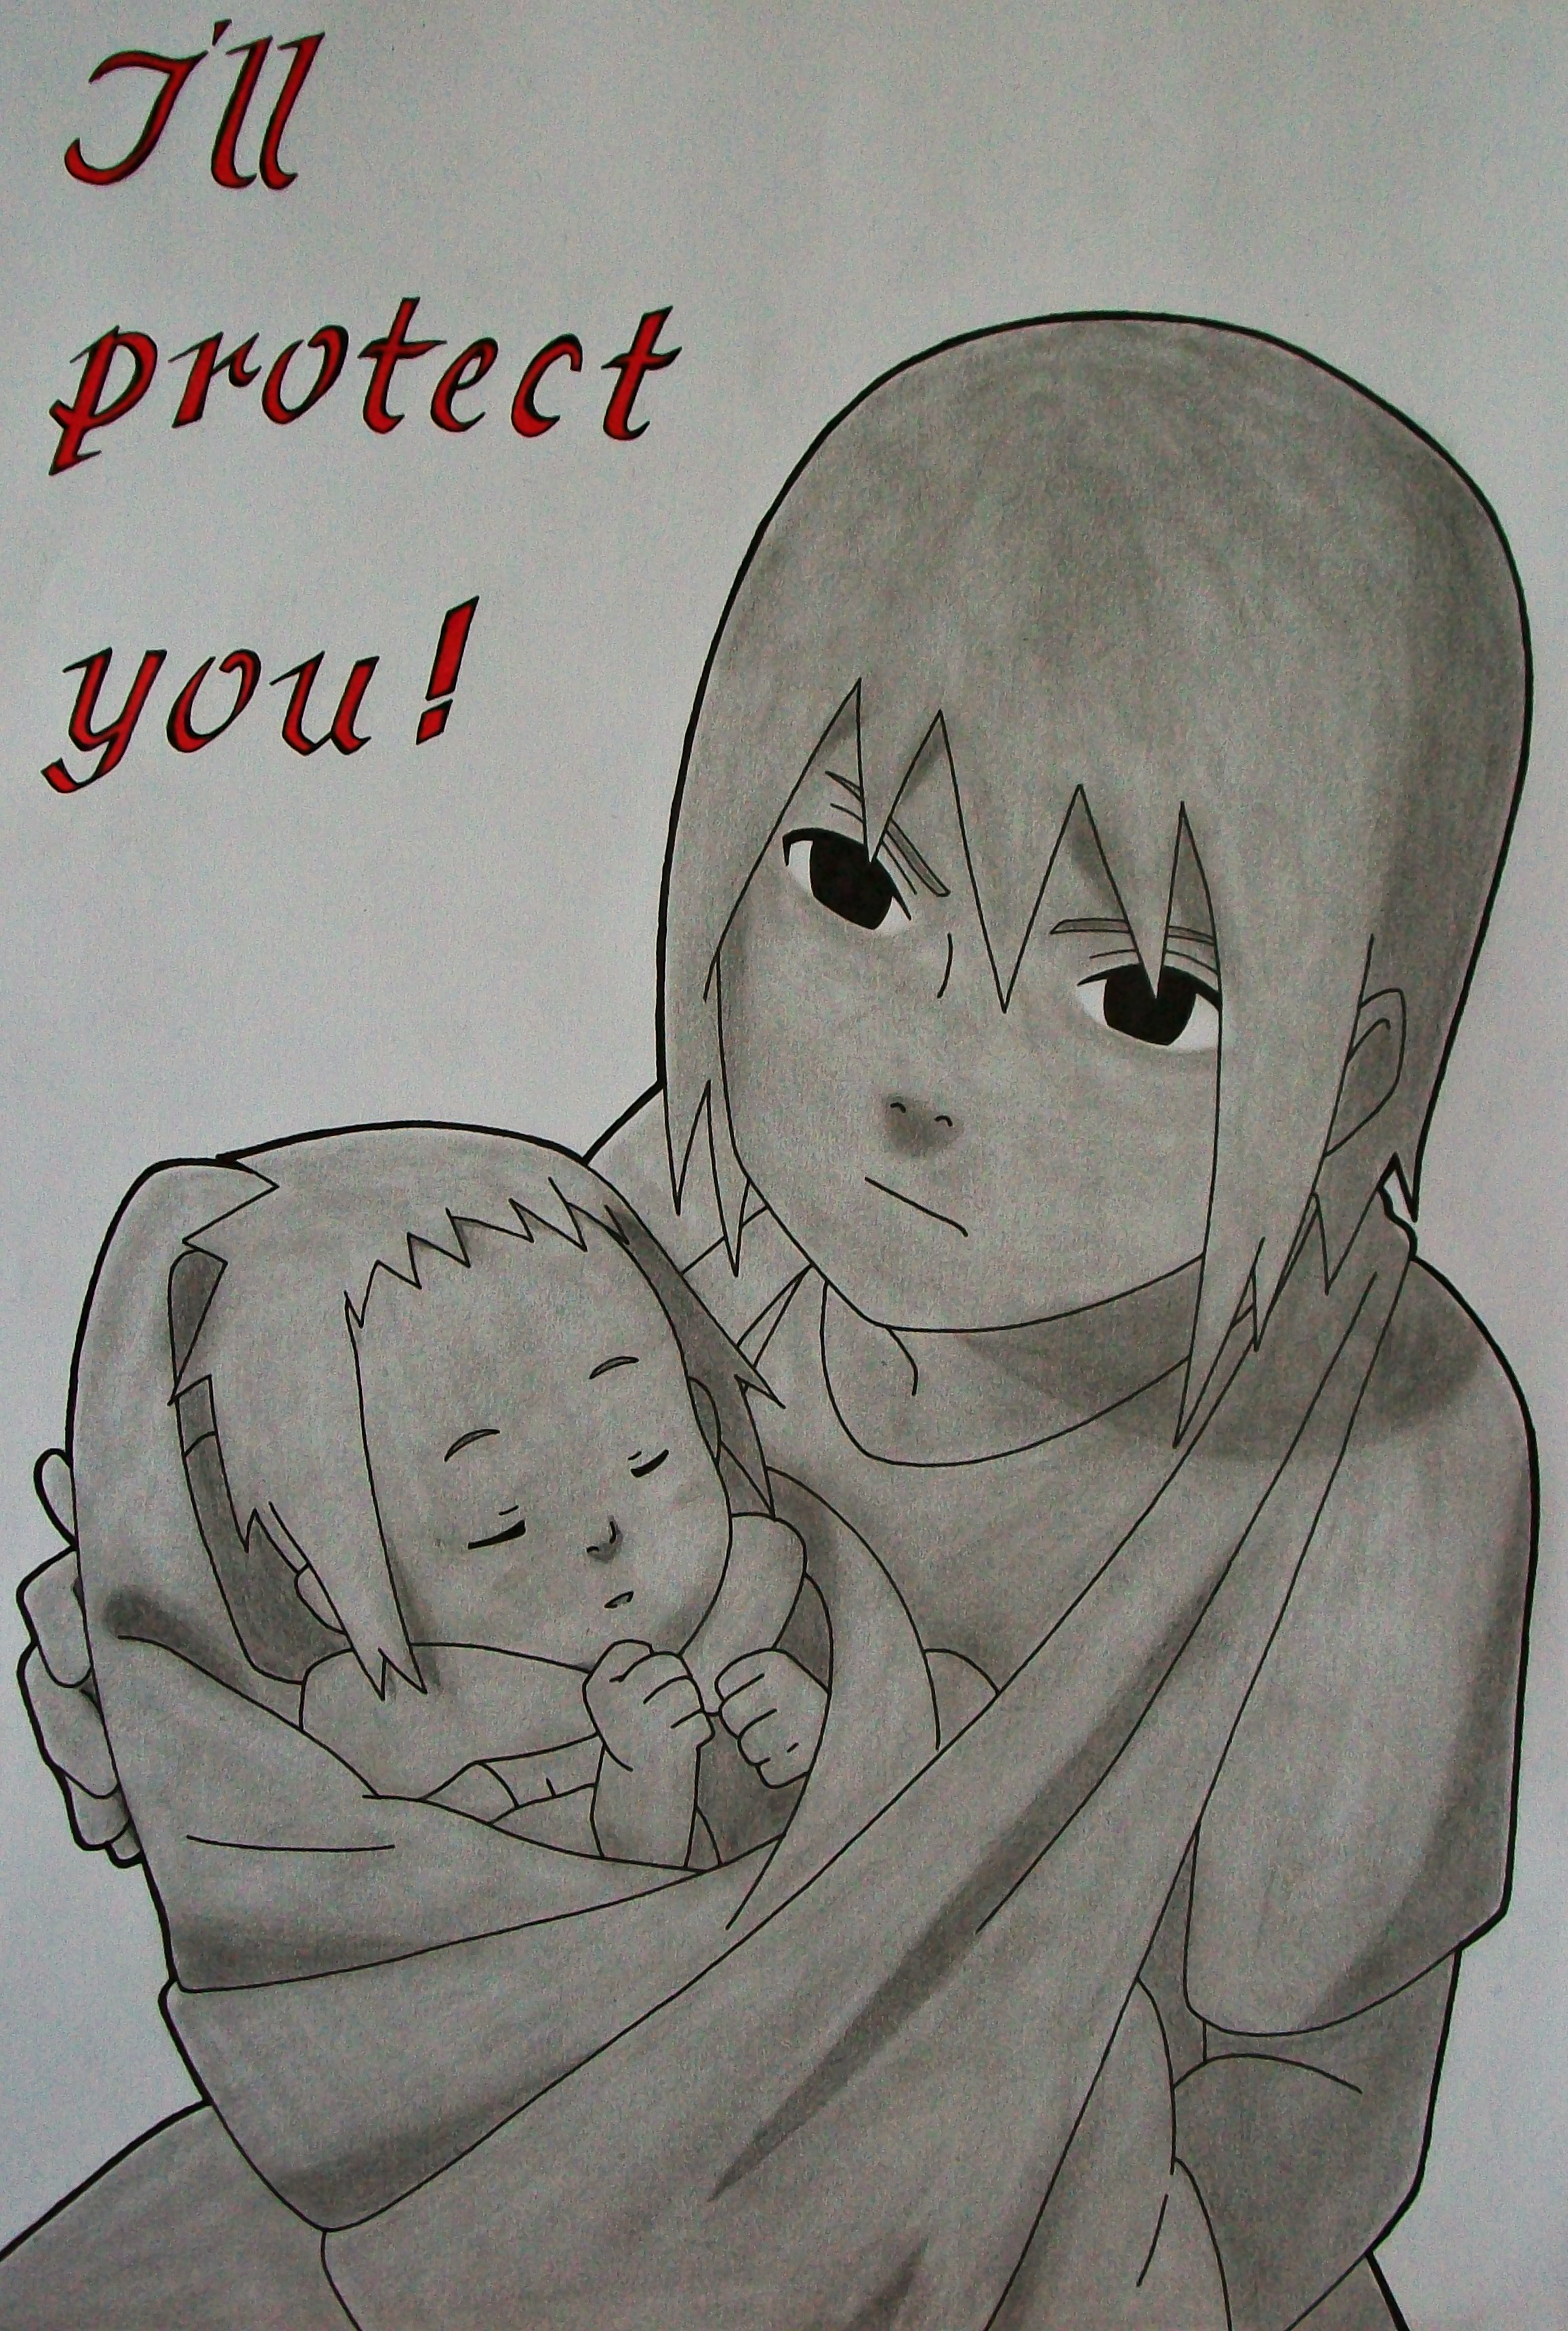 Brotherly Love - Itachi and Sasuke Uchiha by SakakiTheMastermind